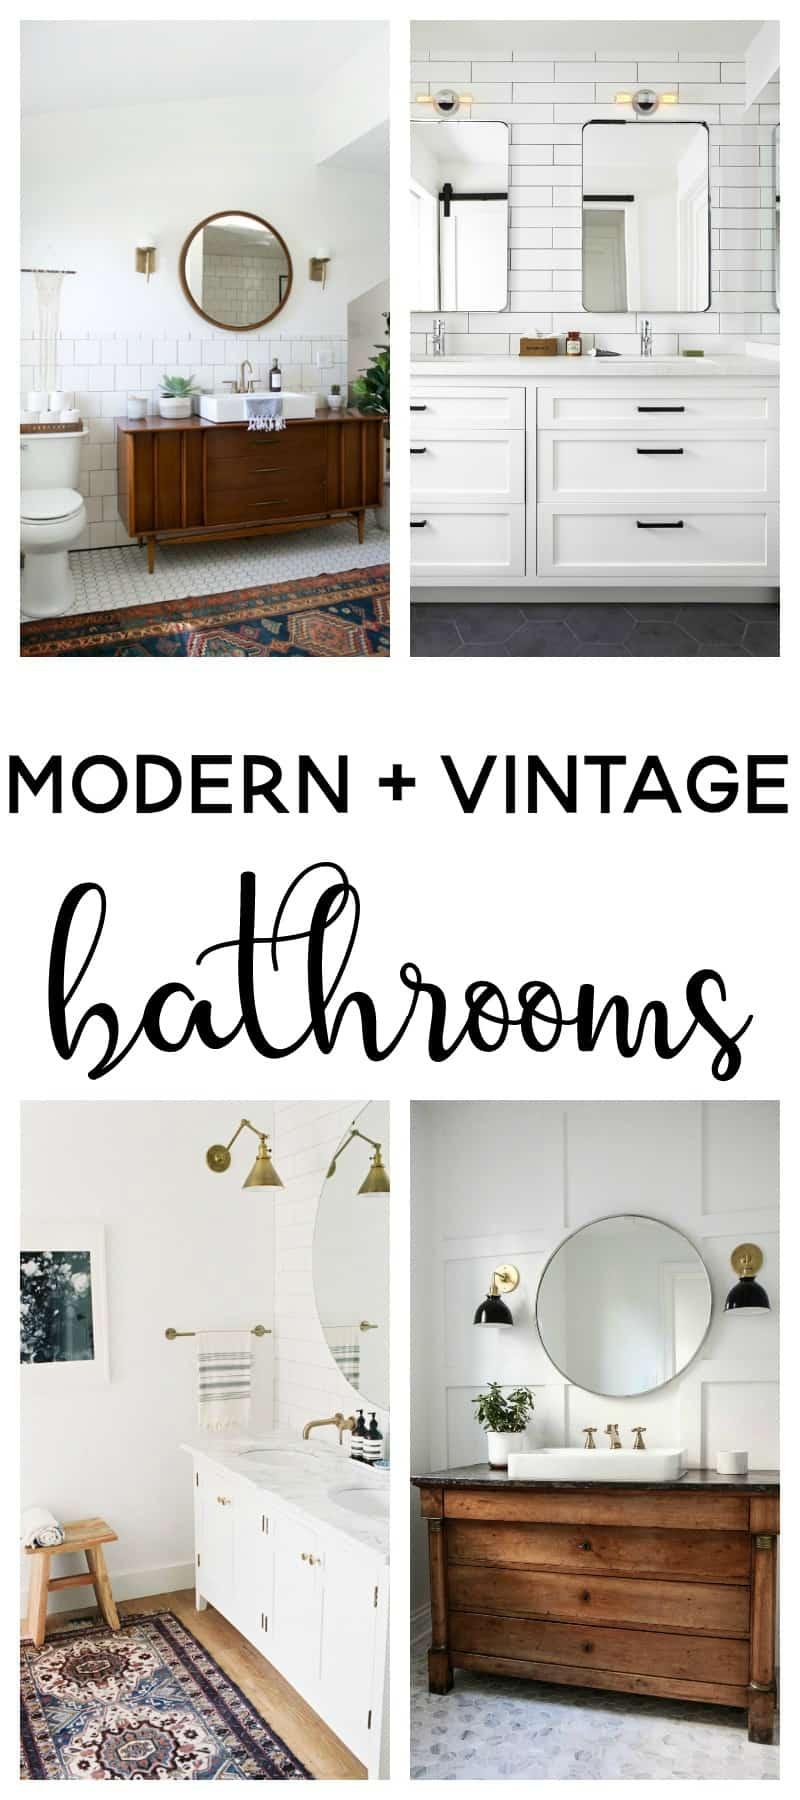 Modern Vintage Bathroom   Modern Farmhouse   Modern Vintage Bathroom Ideas    Bathroom Ideas   Bathroom